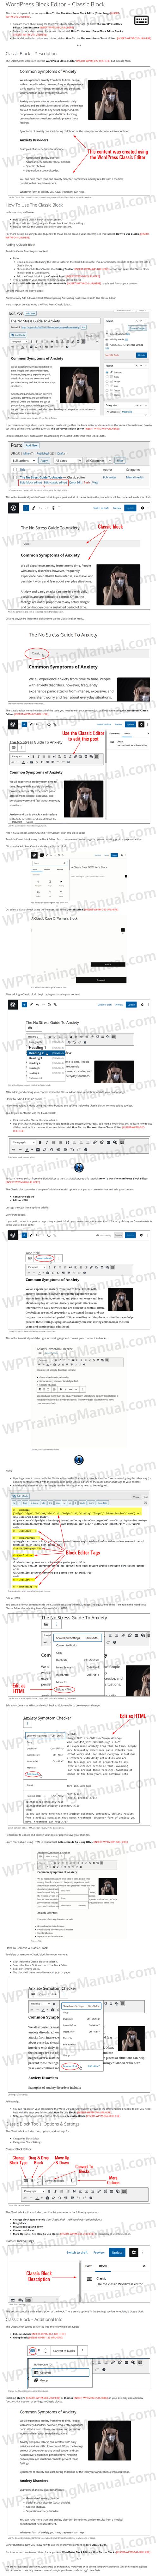 White Label Tutorial: WordPress Block Editor - Classic Block - WPTrainingManual.com